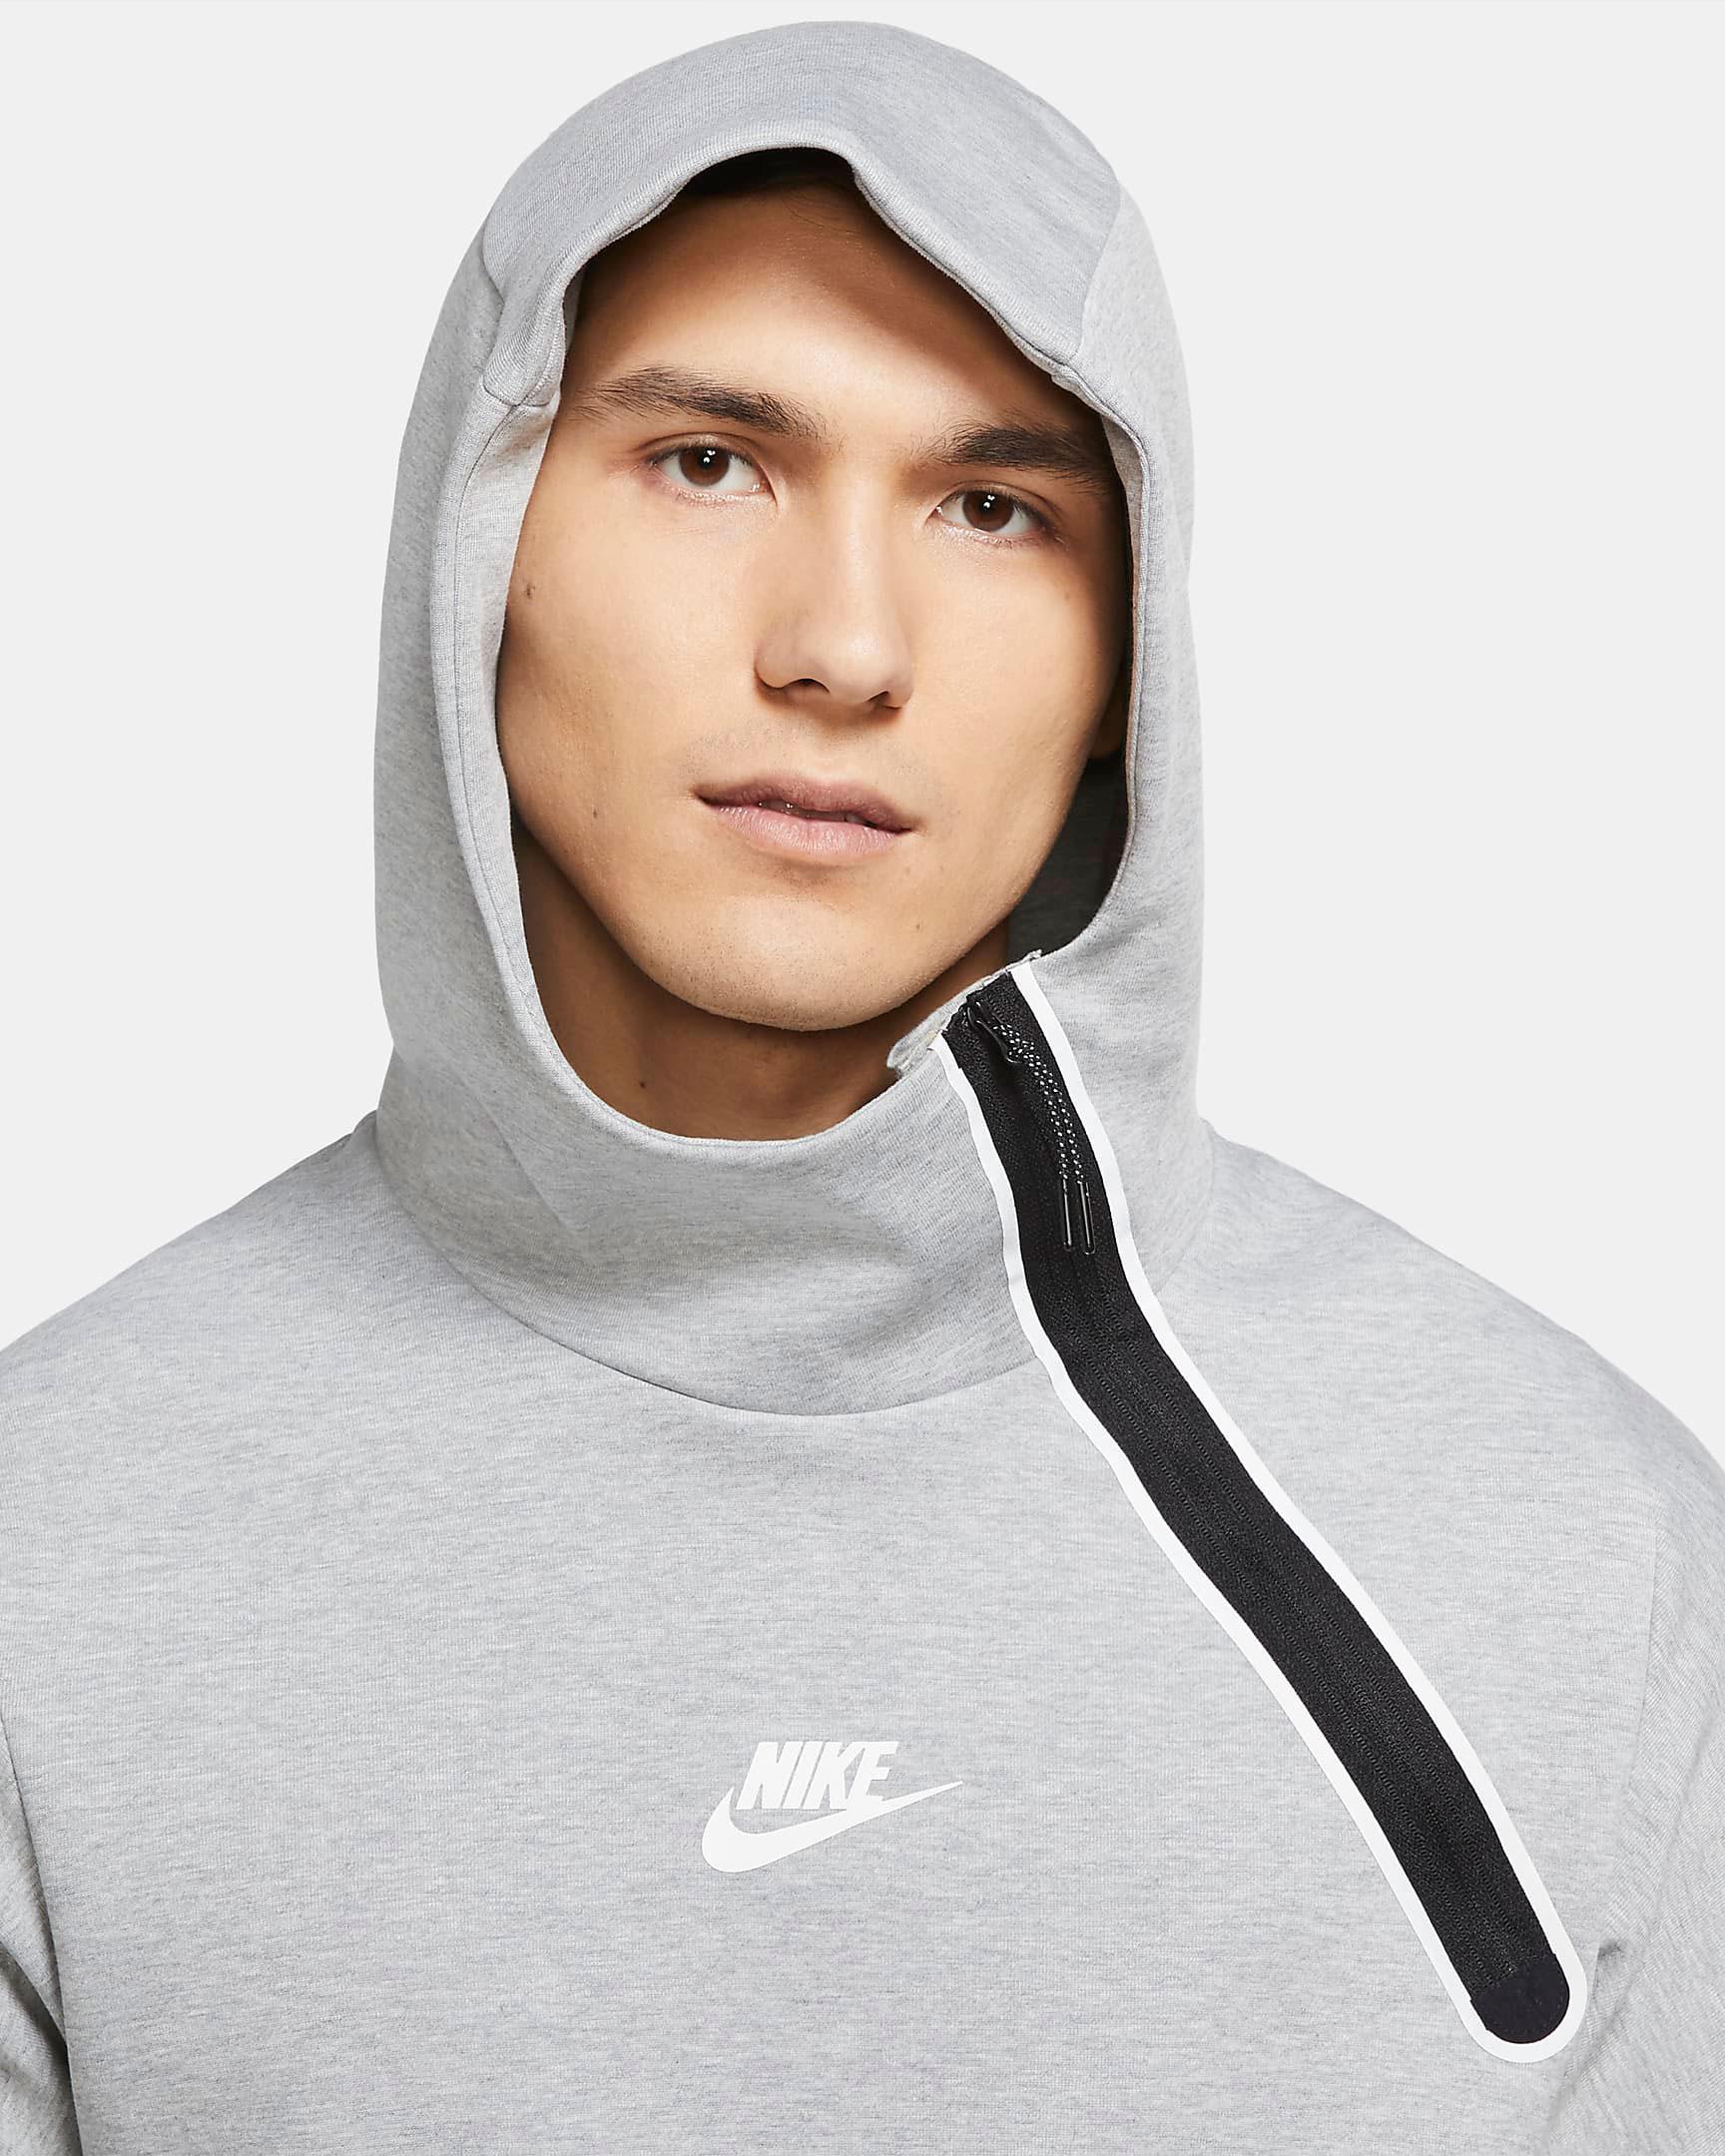 nike-air-max-95-neon-volt-grey-tech-fleece-hoodie-2